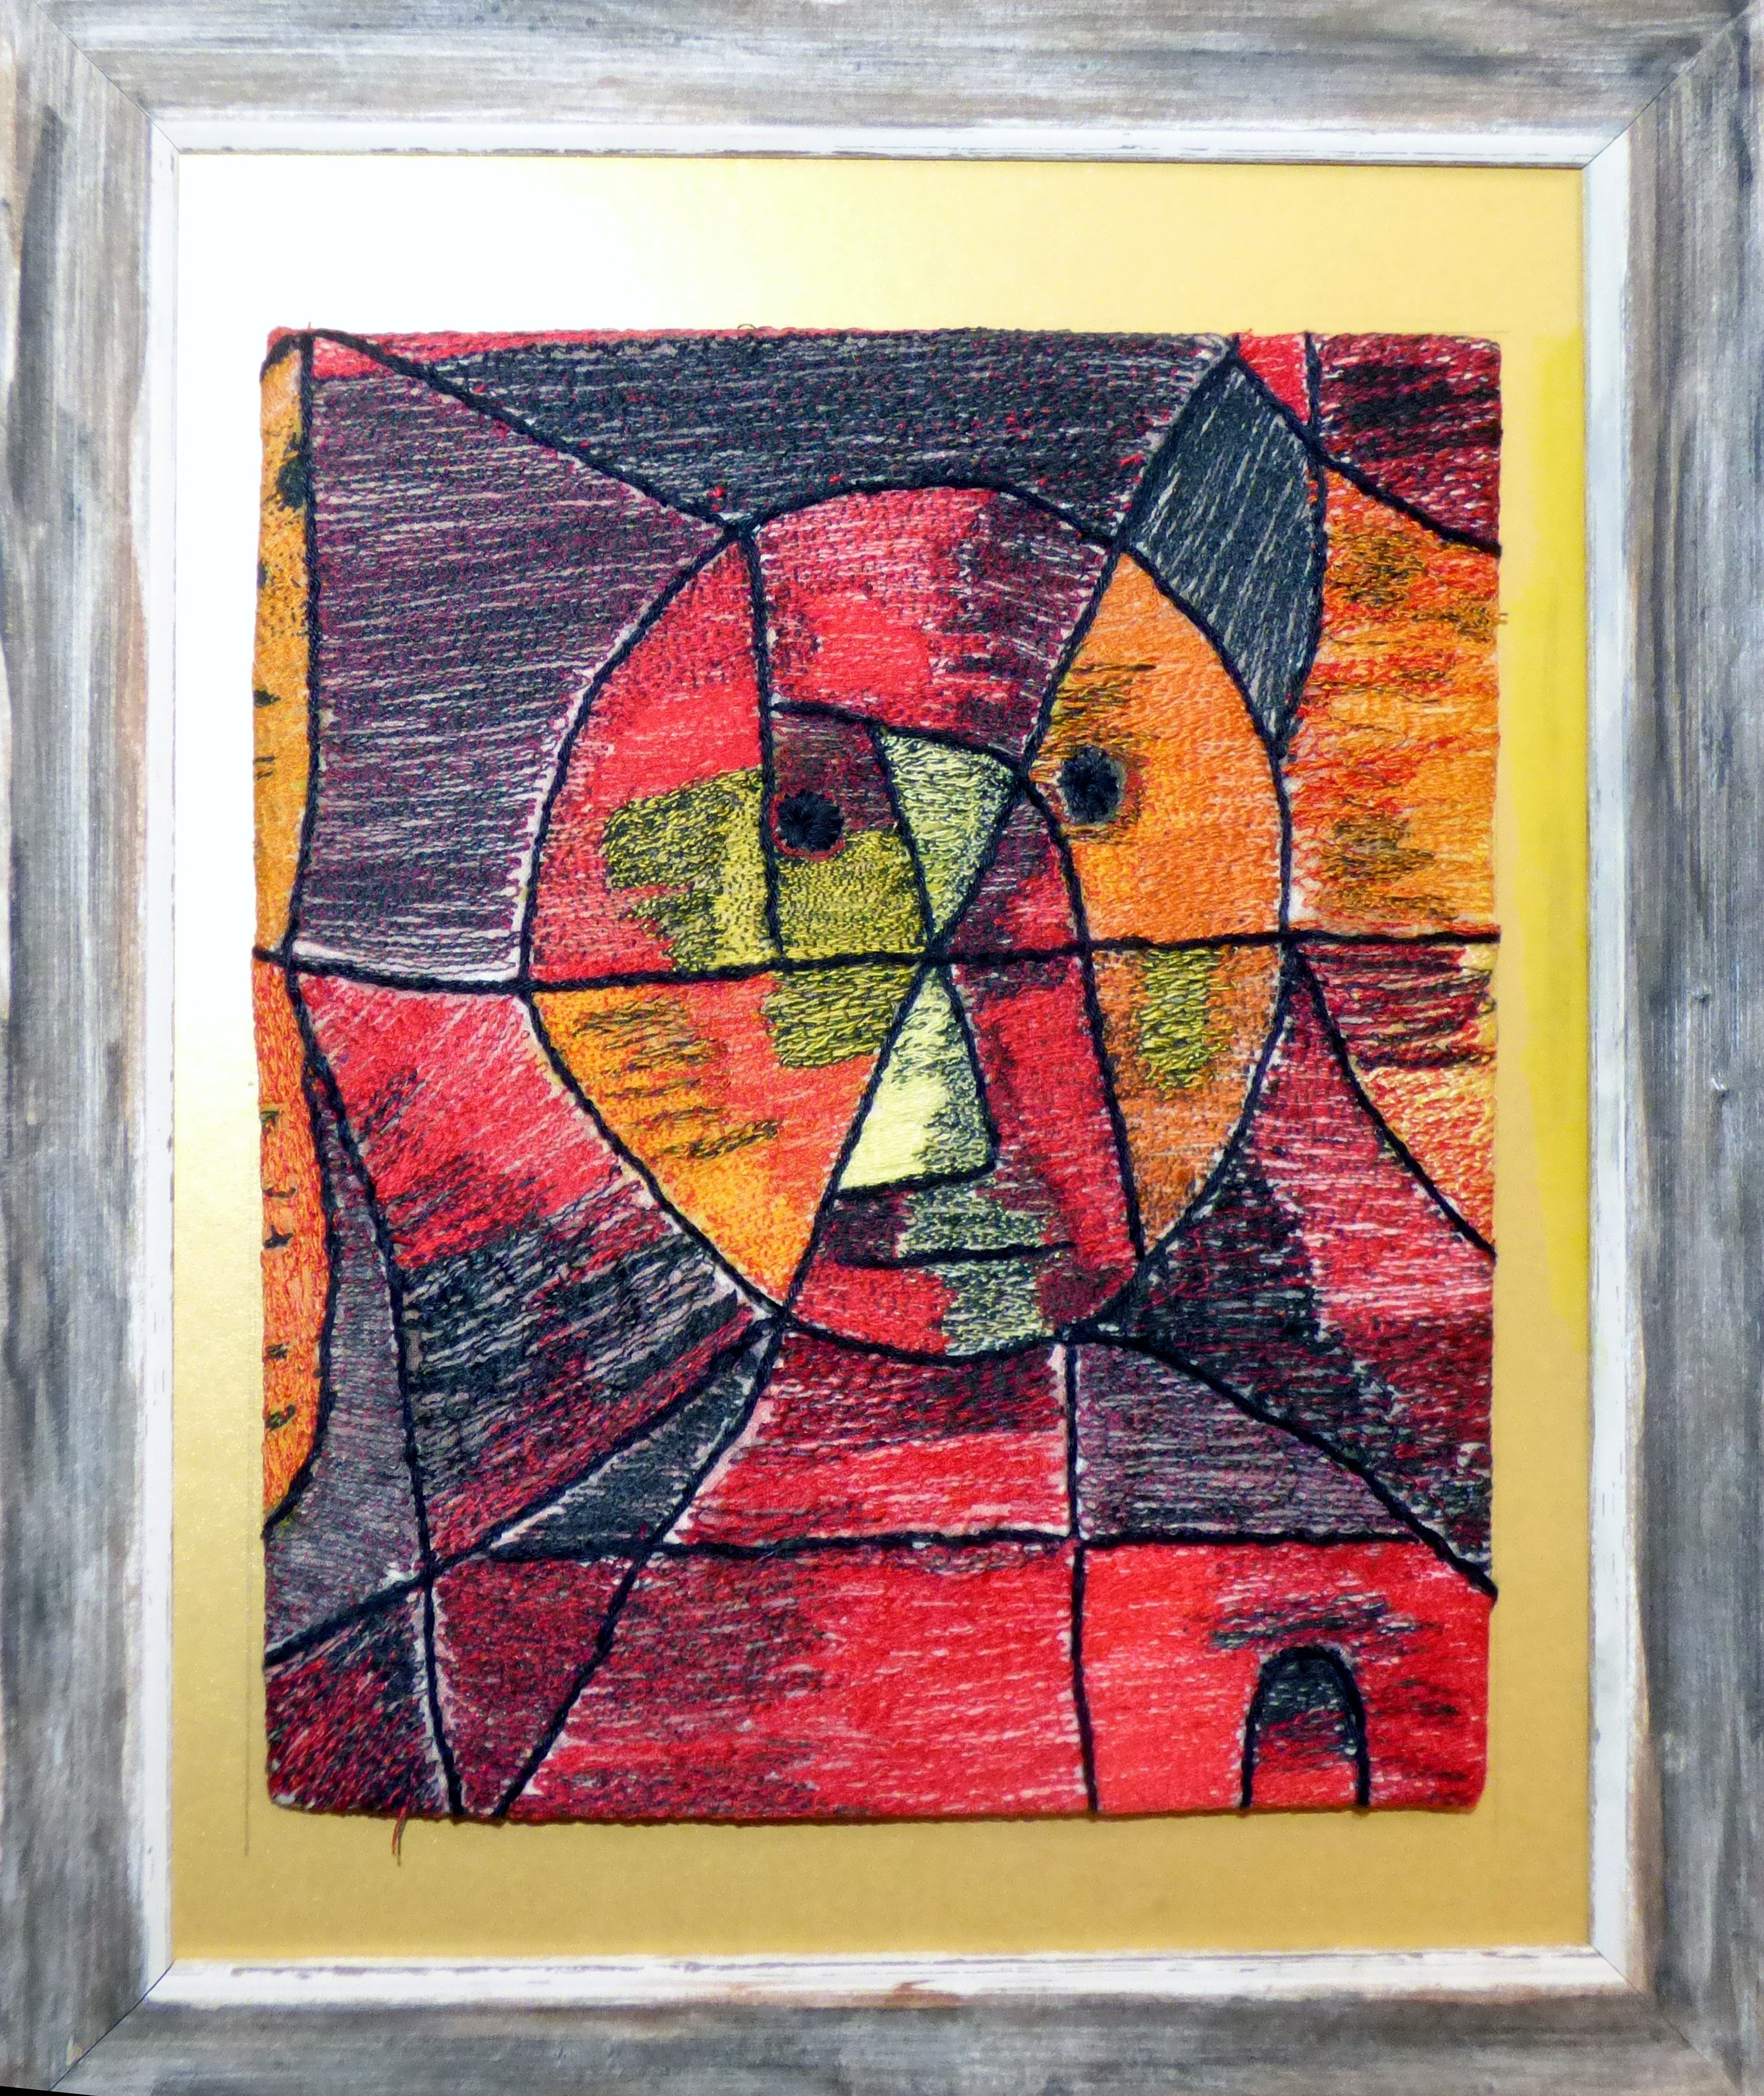 MODERN MAN by Gill Marshall, machine stitch portrait based on Paul Klee